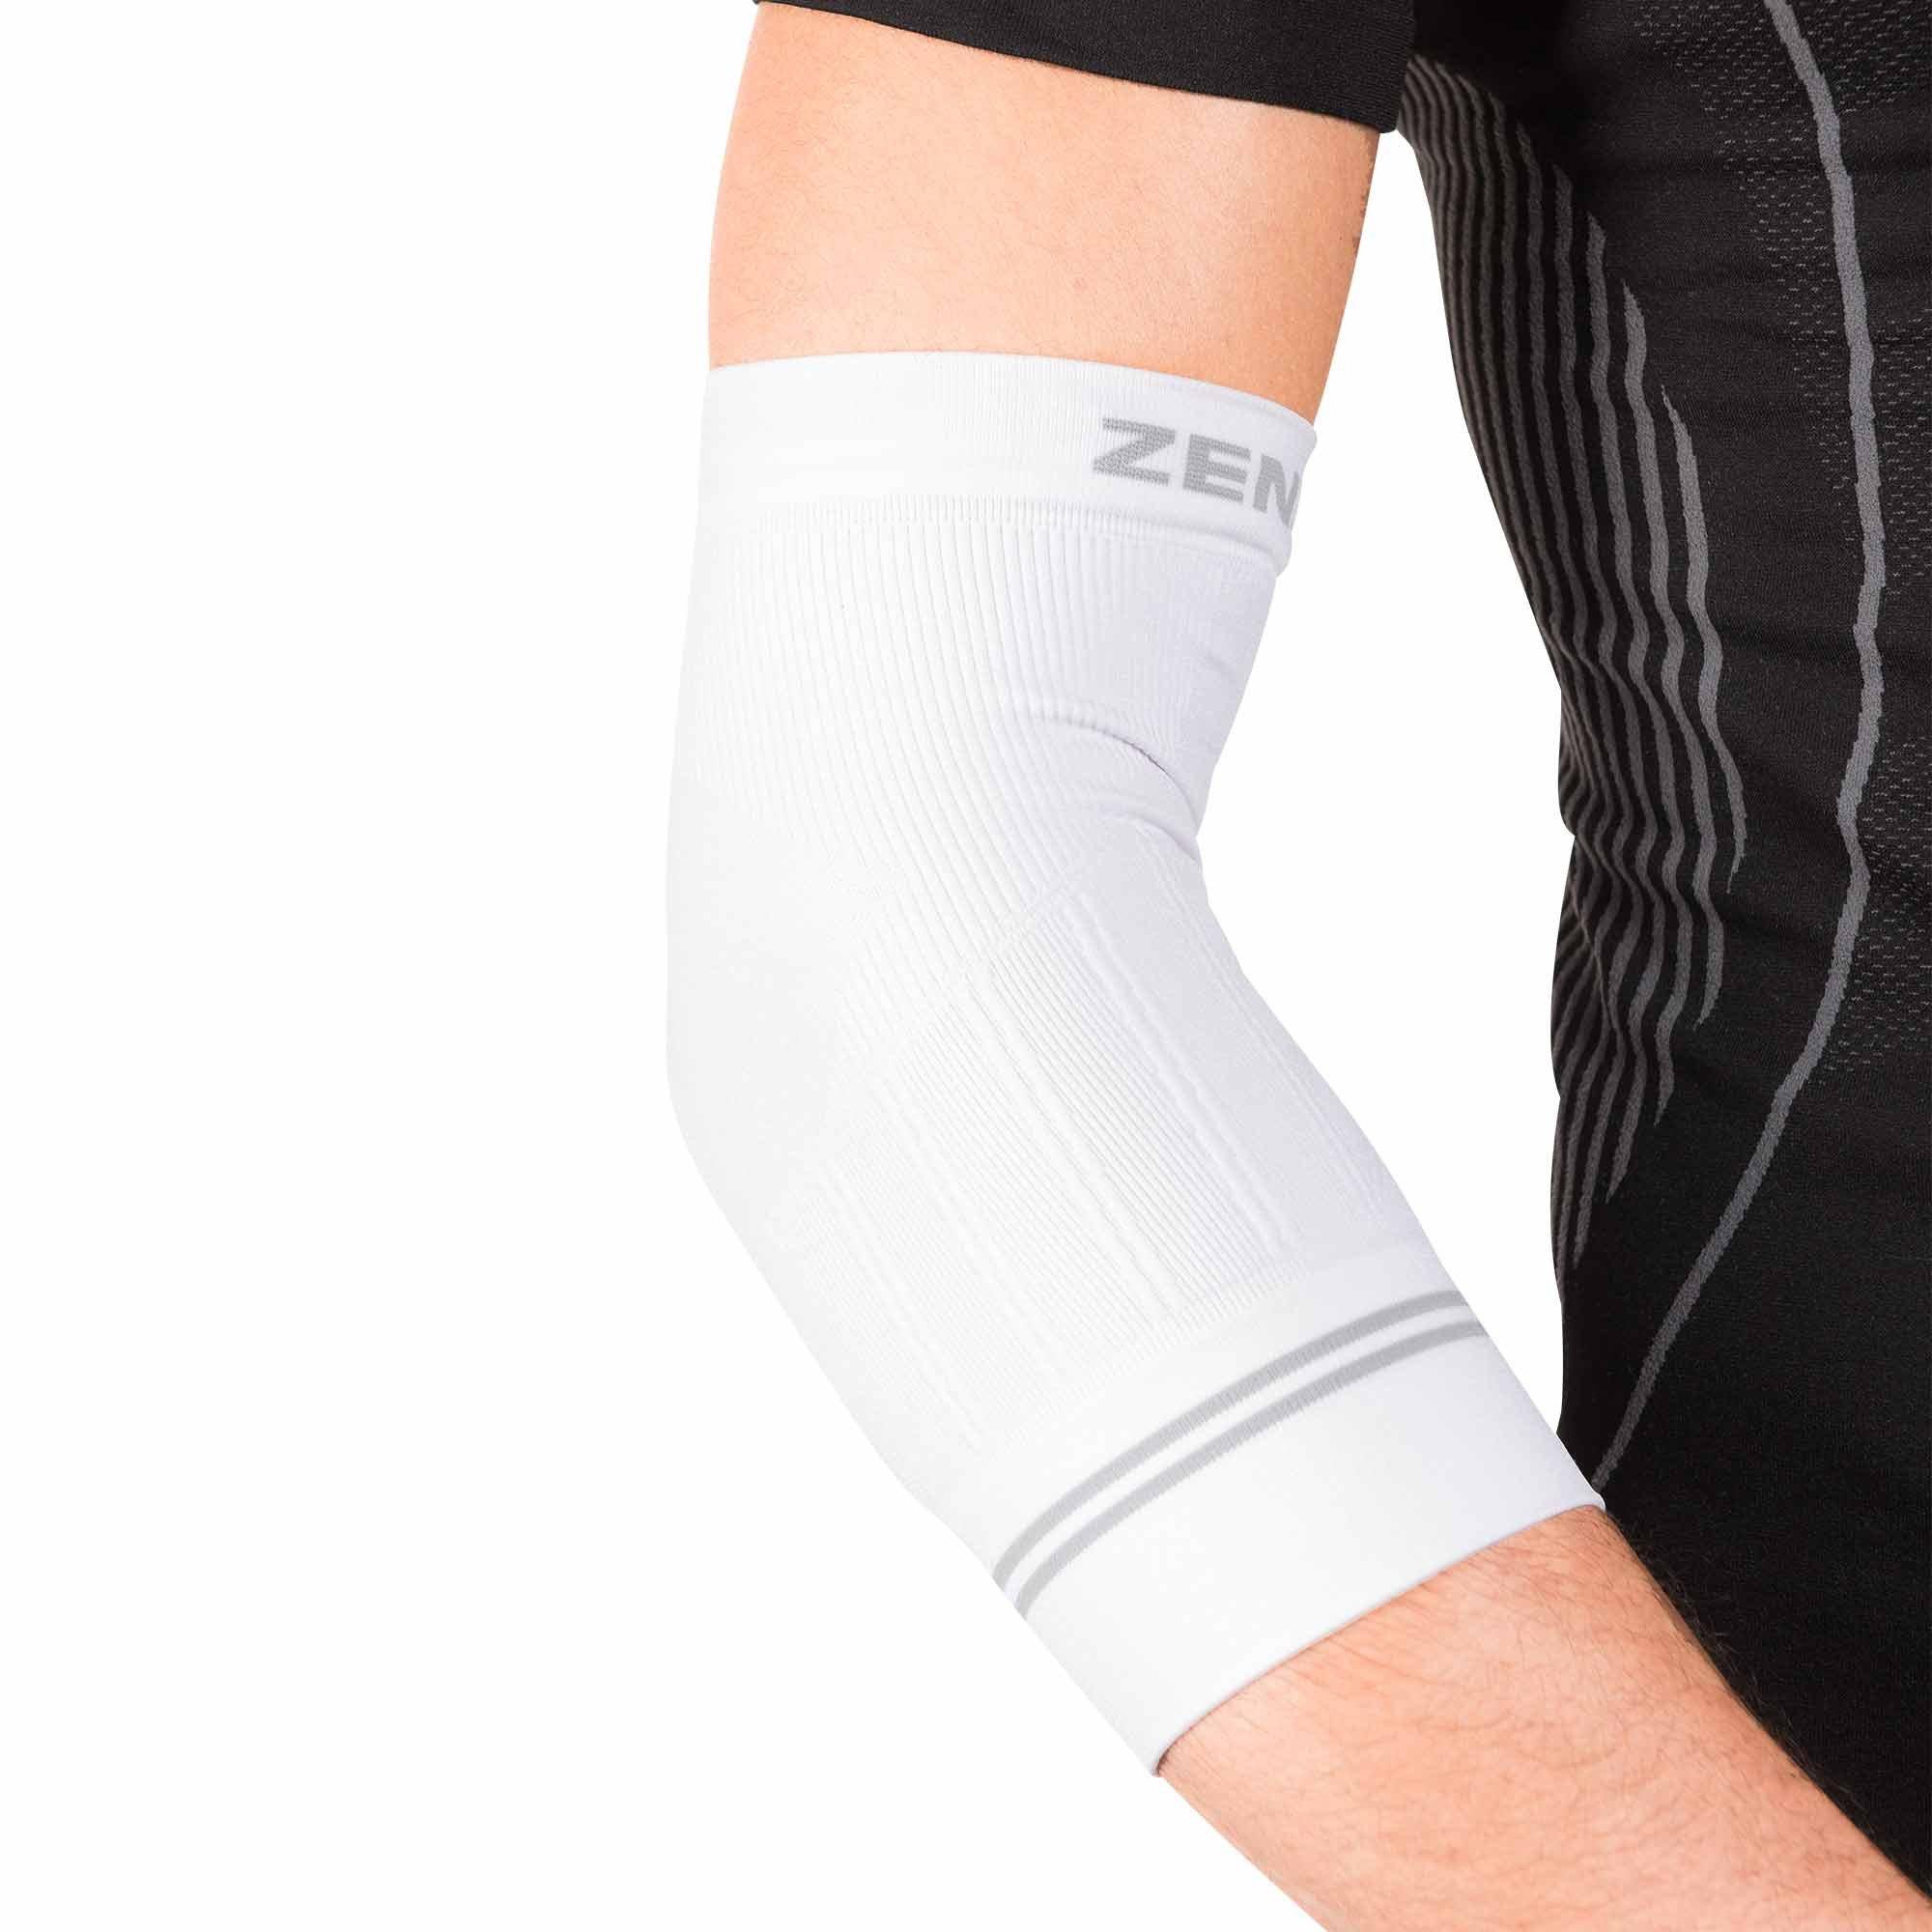 Zensah Compression Tennis Elbow Sleeve for Elbow Tendonitis, Tennis Elbow, Golfer's Elbow - Elbow Support, Elbow Brace, Large, White by Zensah